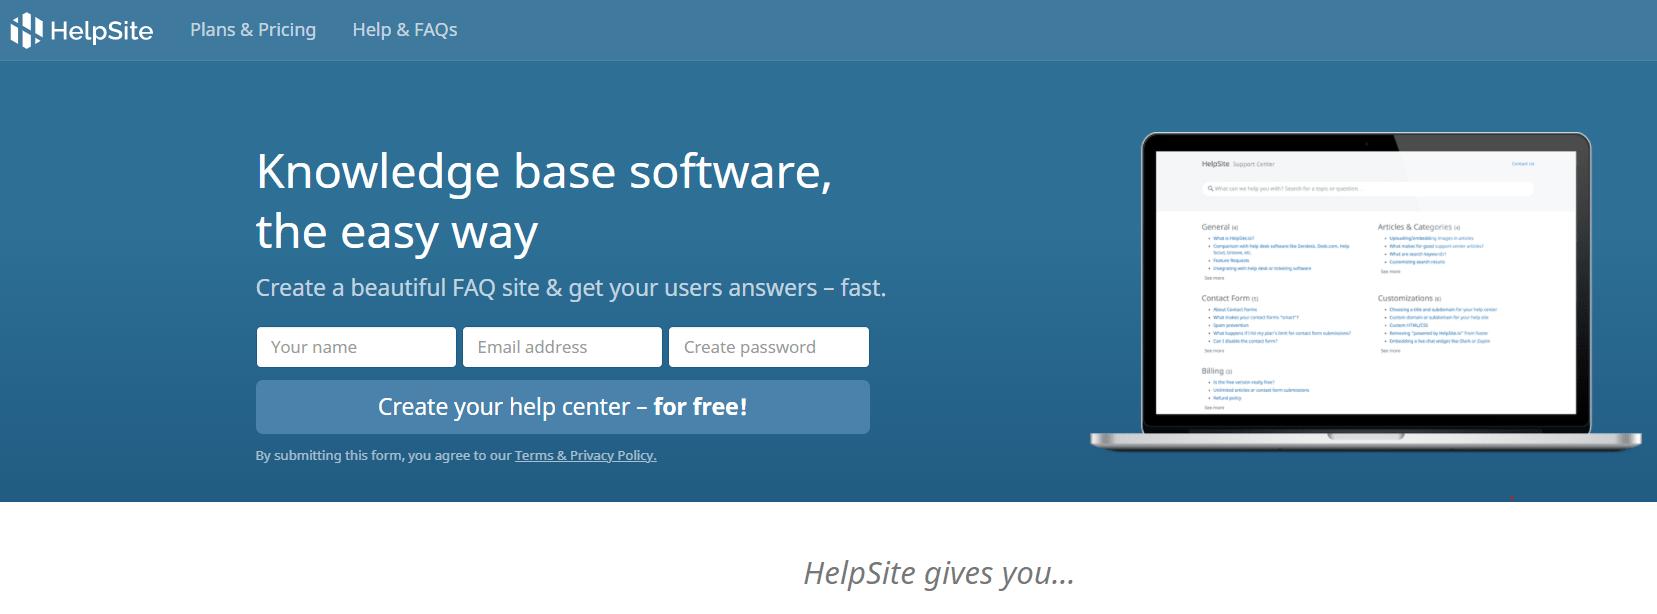 Helpsite Knowledge base